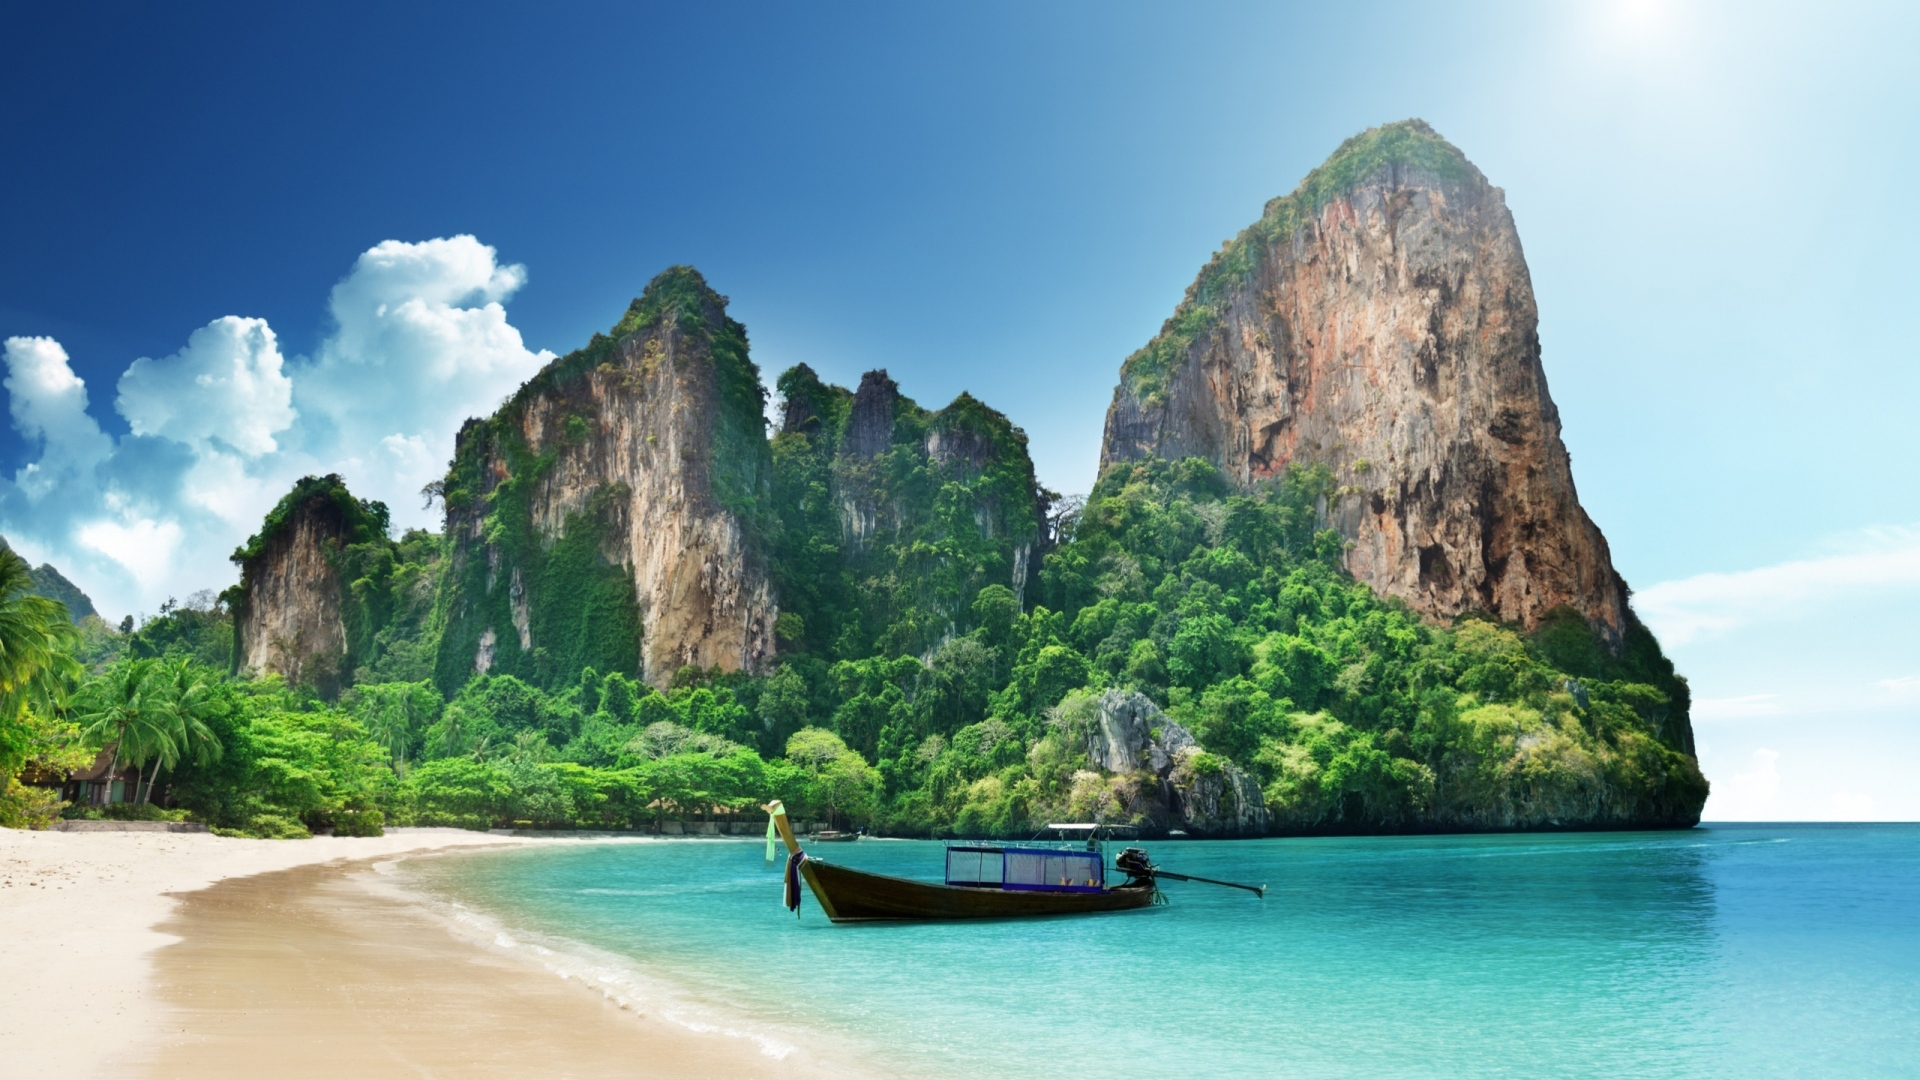 Full HD 1080p Thailand Wallpapers HD, Desktop Backgrounds